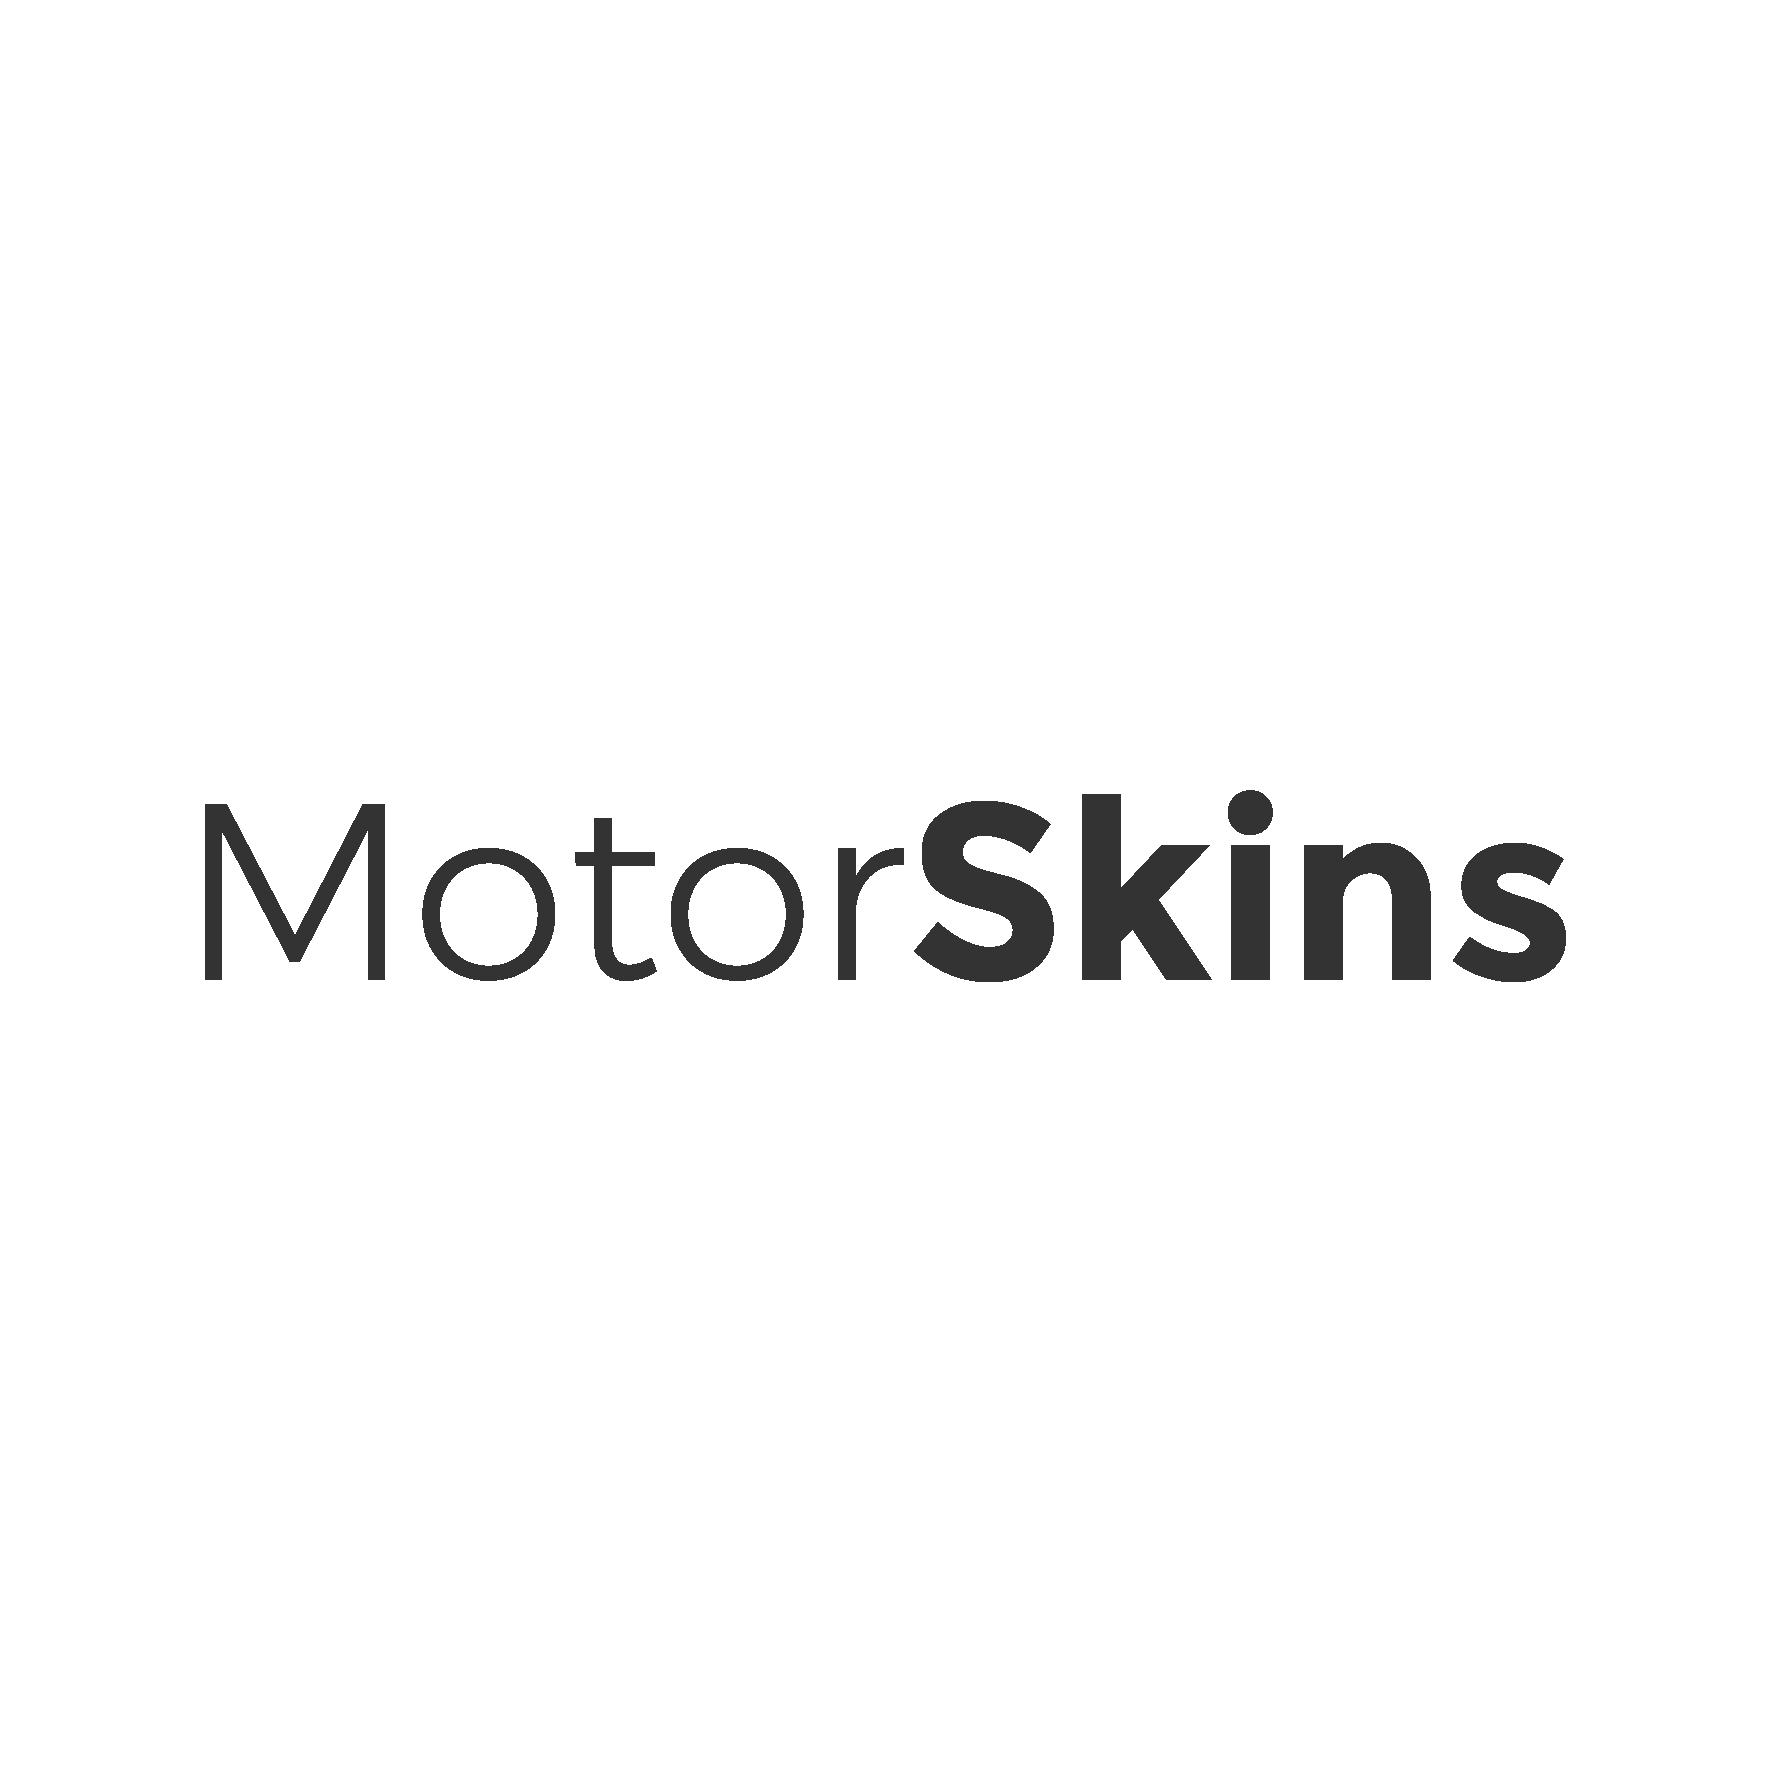 Motorskins.png